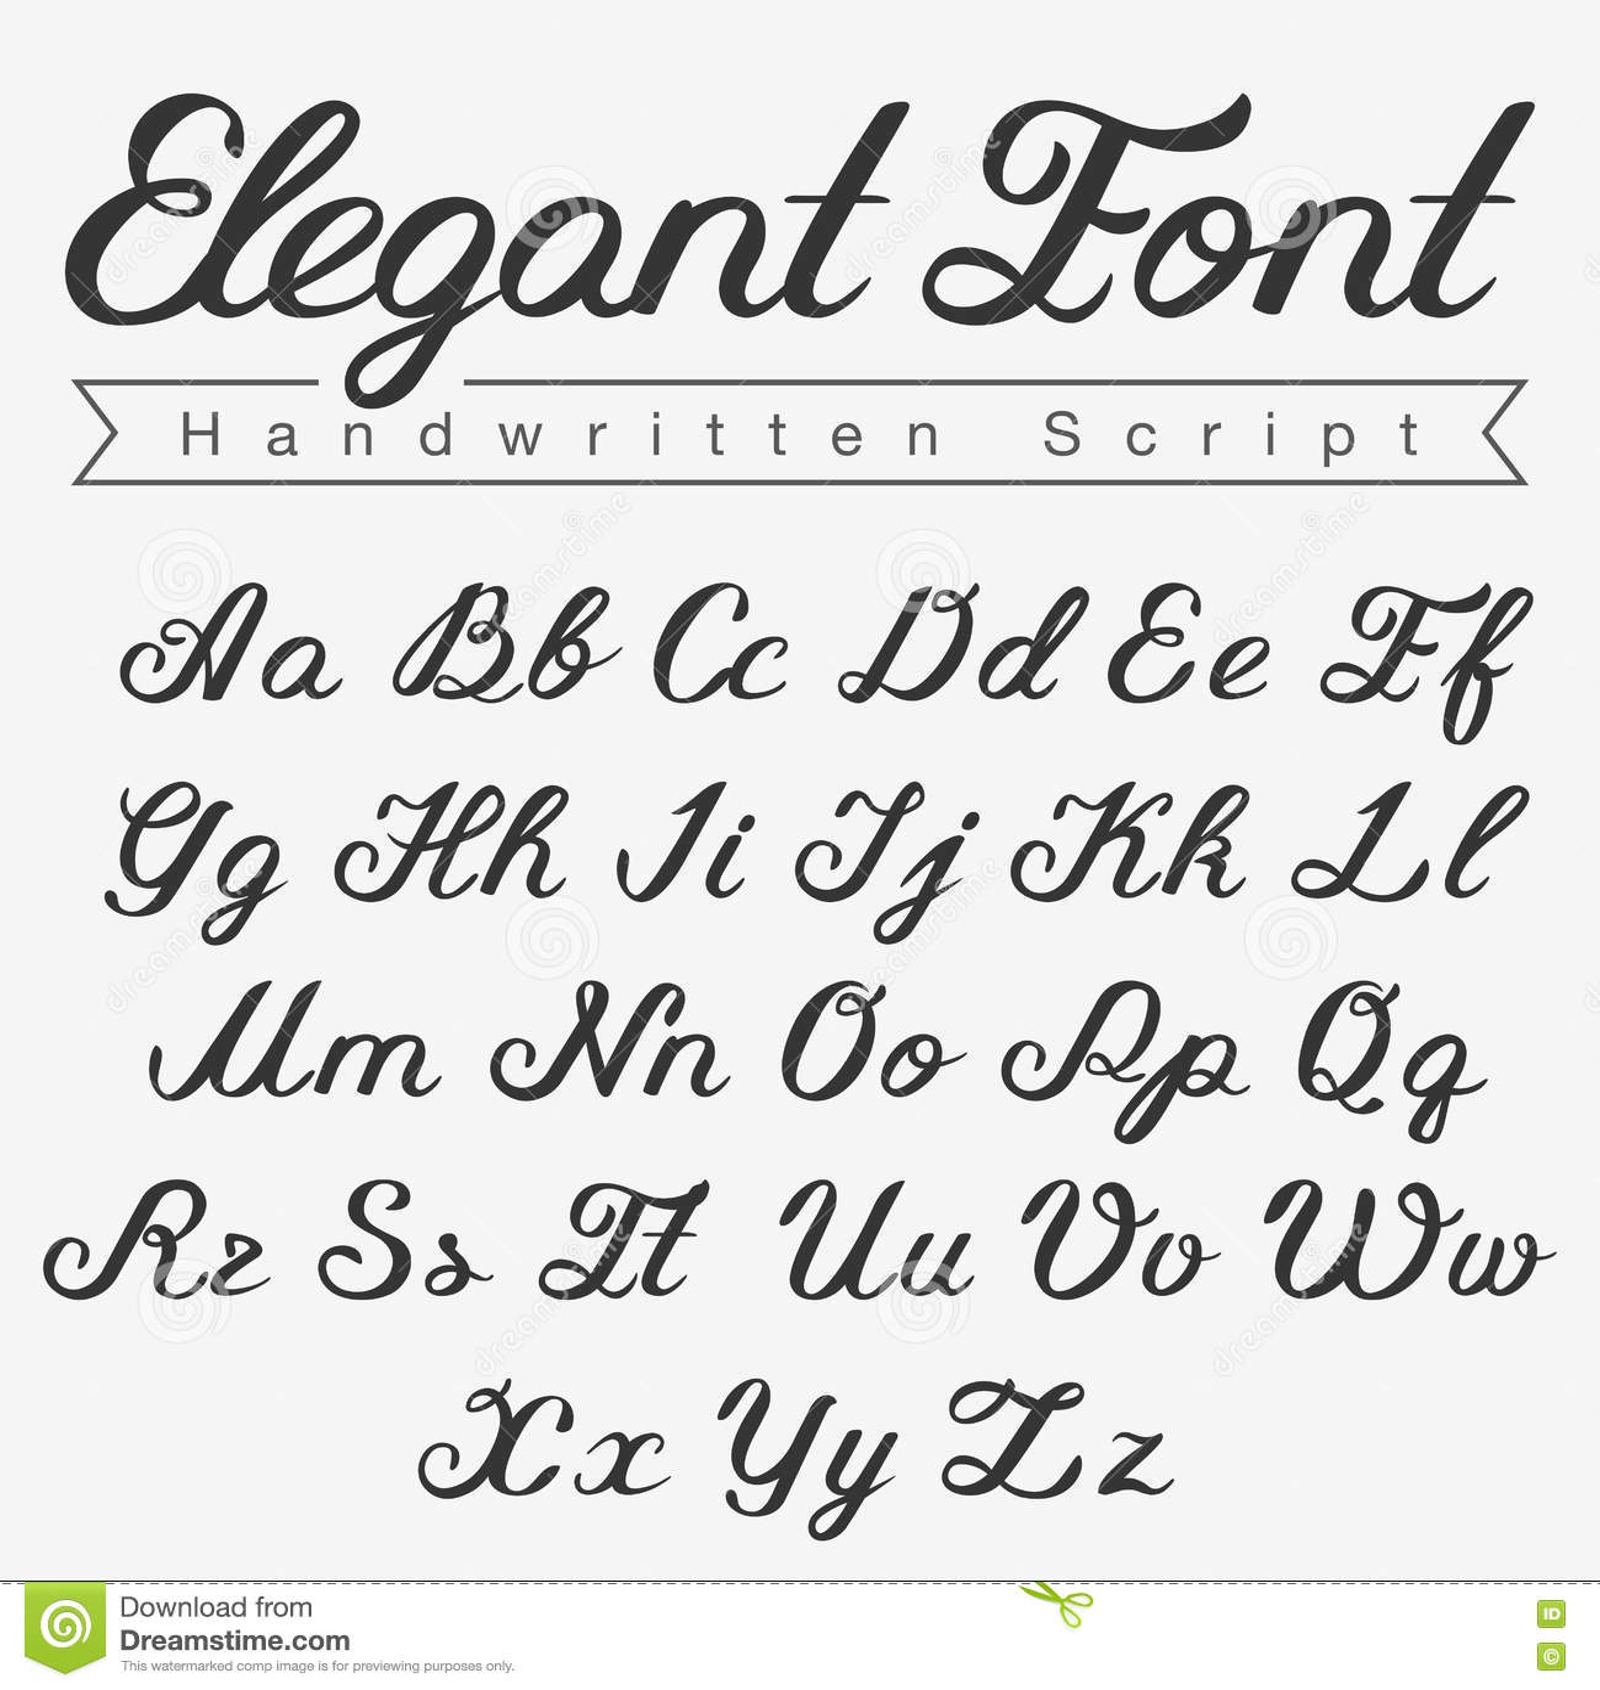 photoshop elements 15 manual pdf